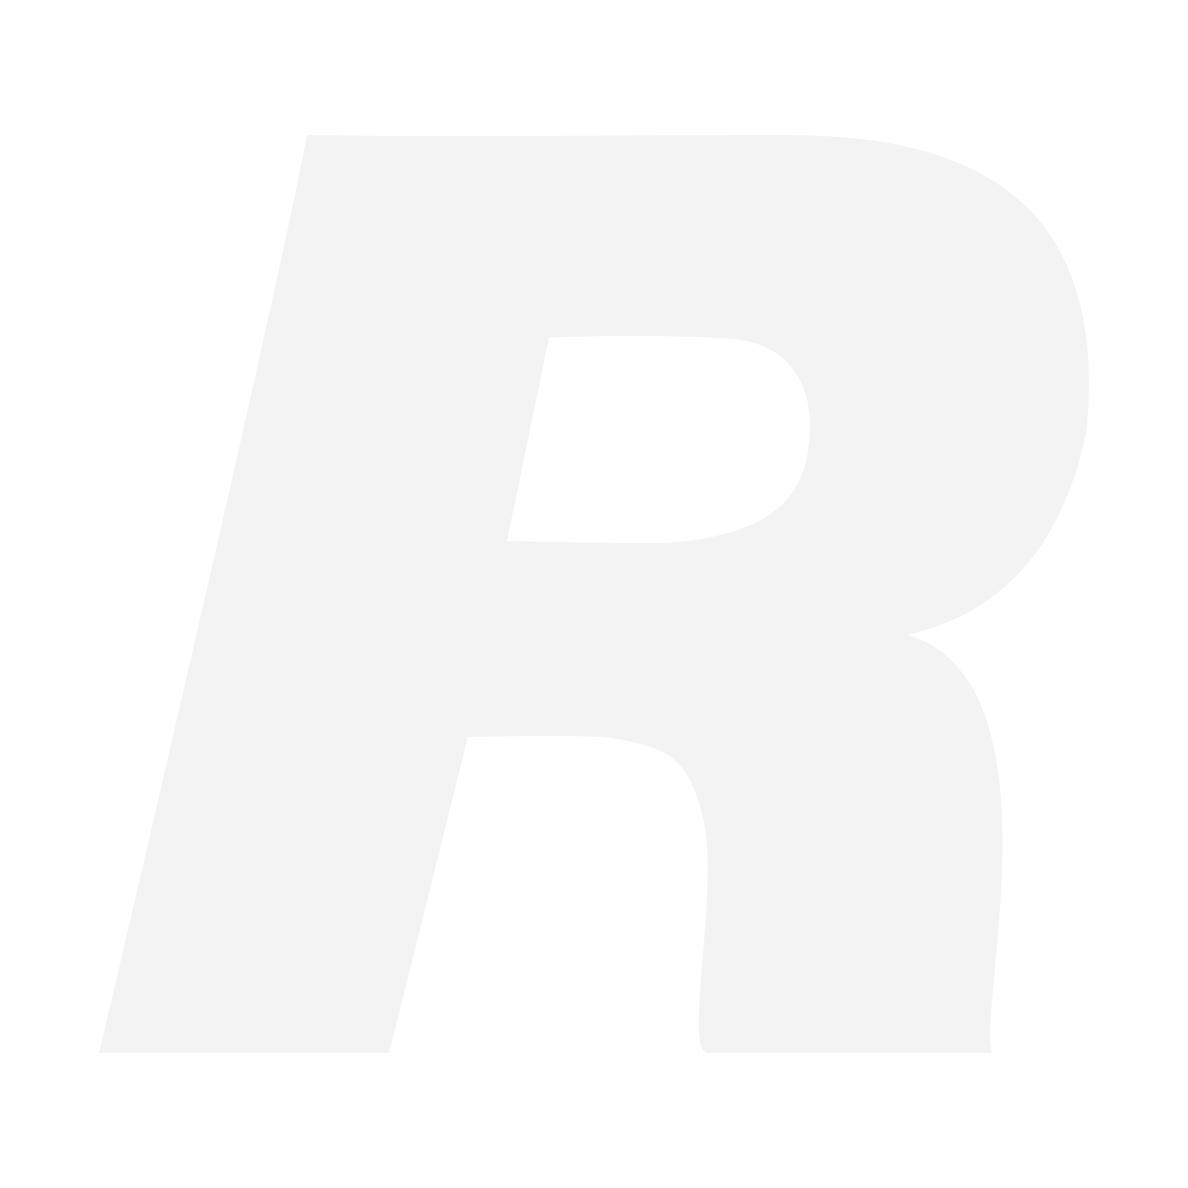 Lastolite LR3631 TriGrip Reflector Silver/White 75cm